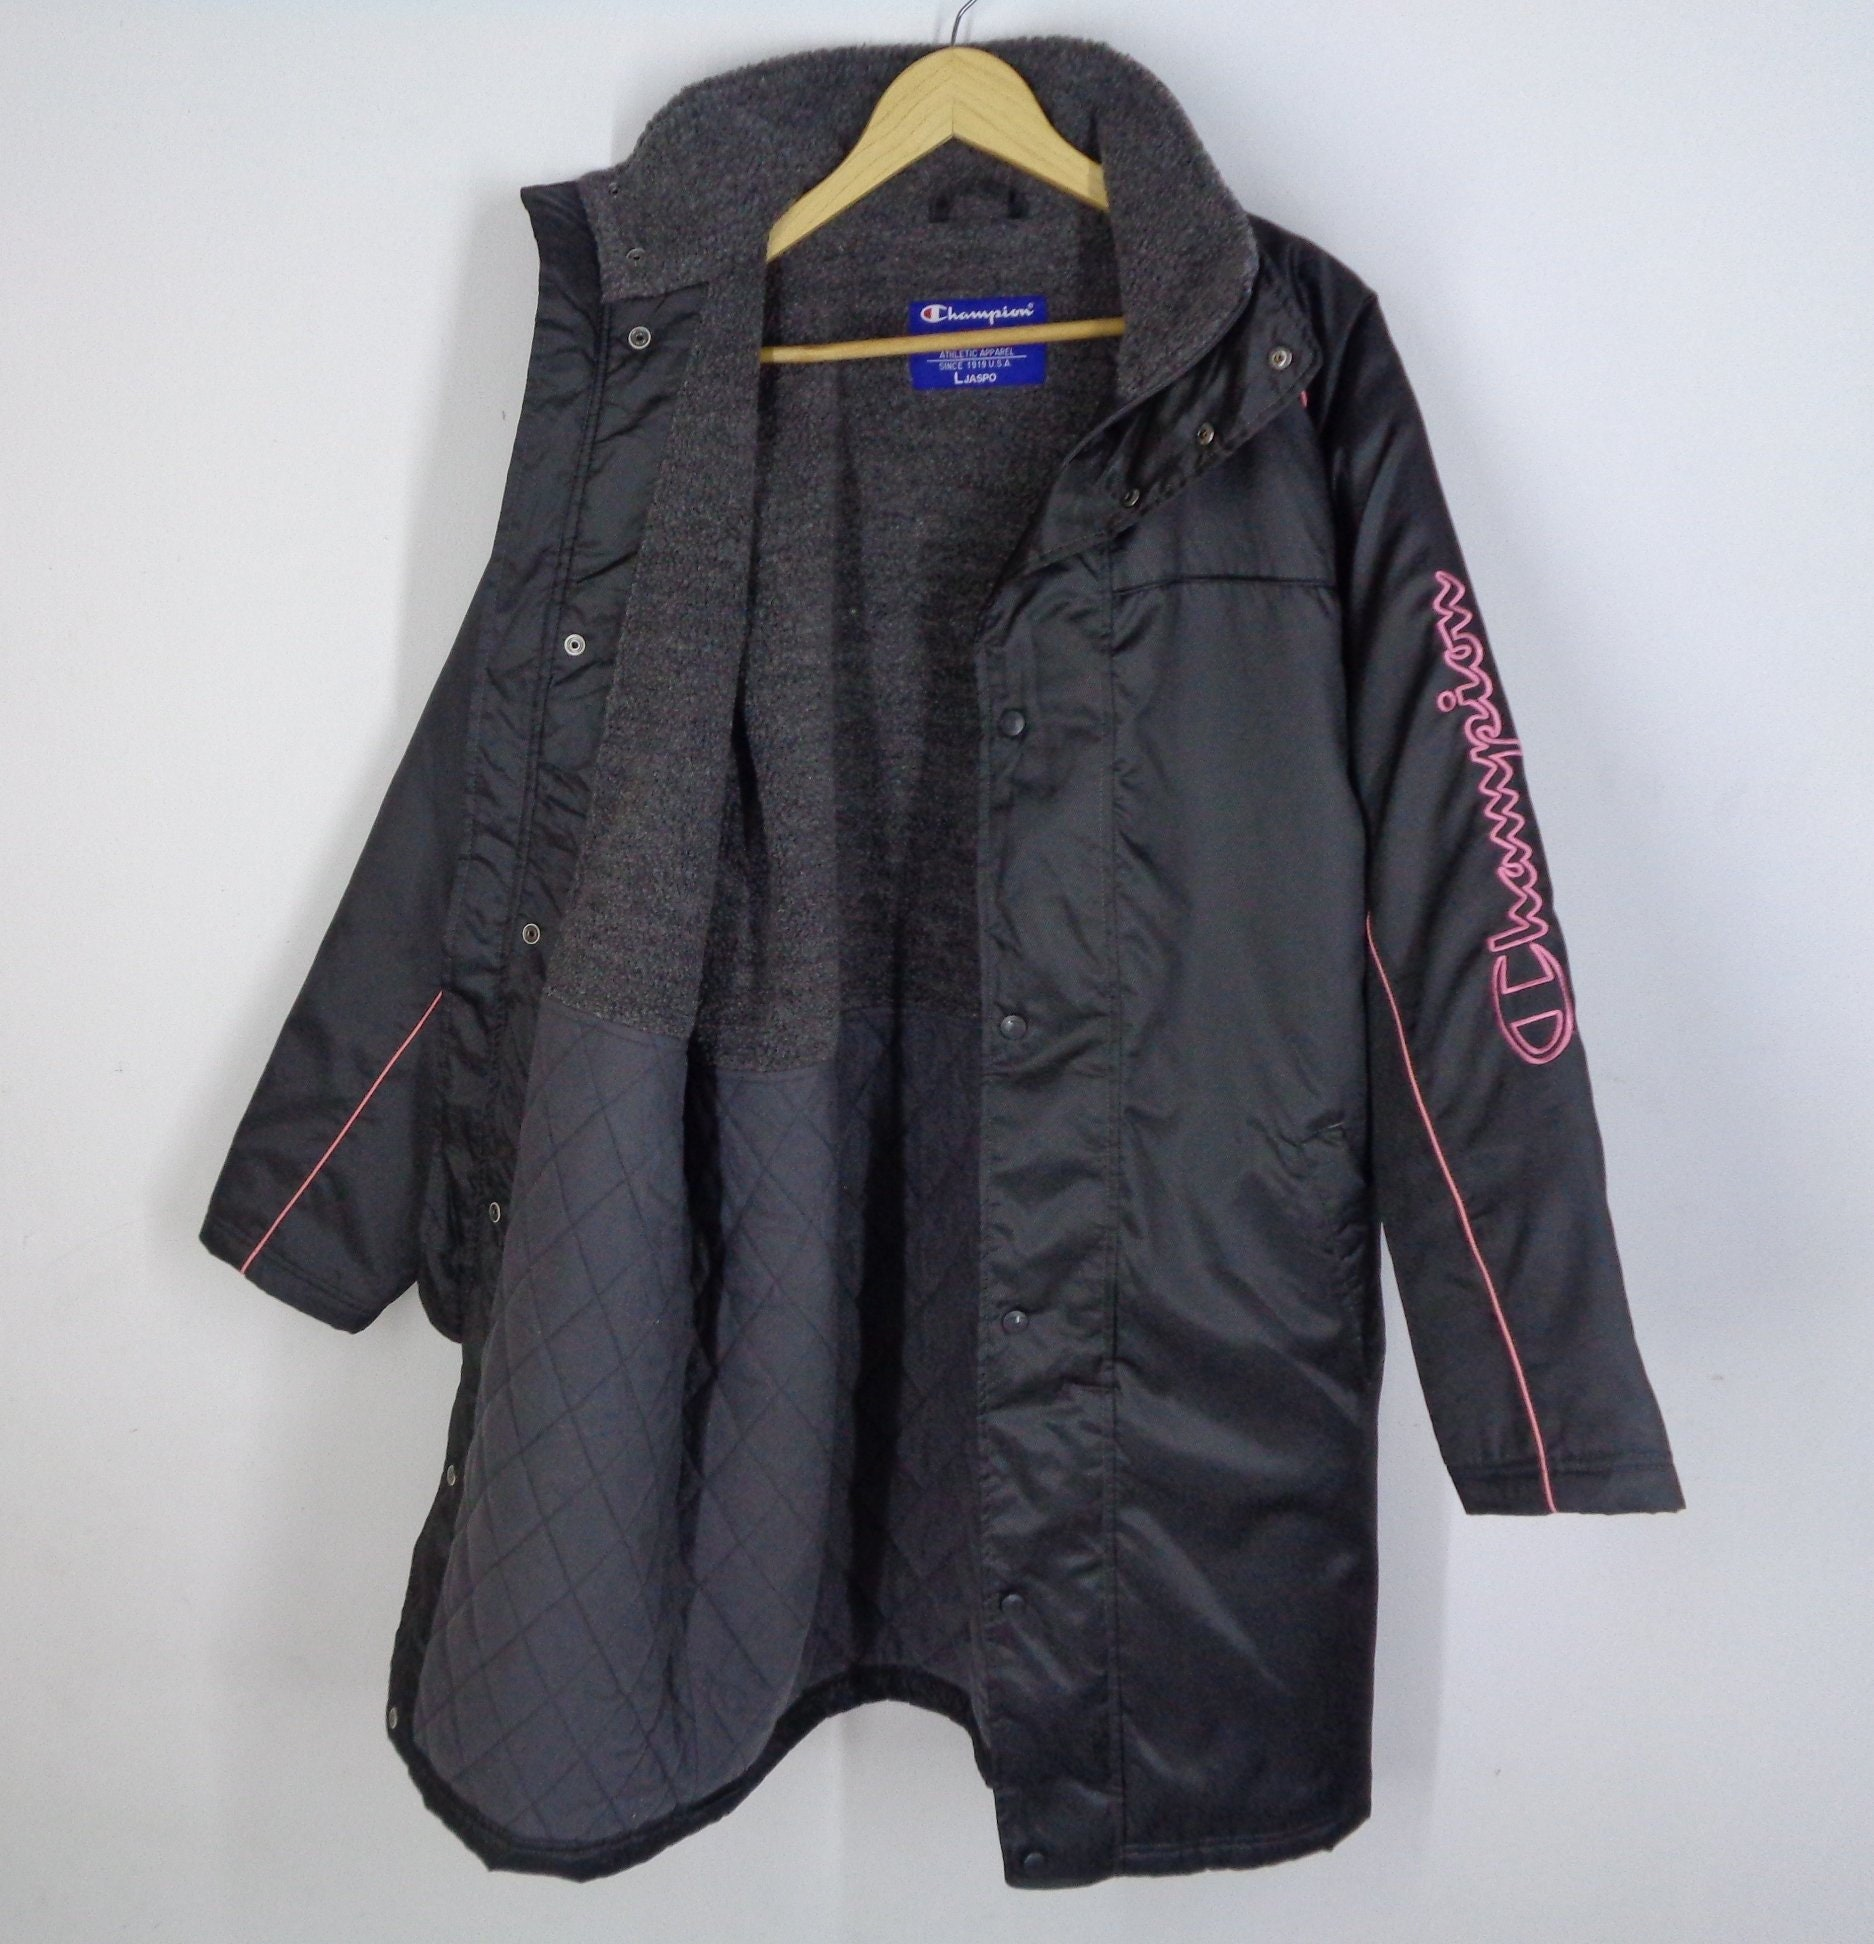 8cab66d7ec50 CHAMPION Parka Jacket Vintage 90 s CHAMPION Big Logo Spell